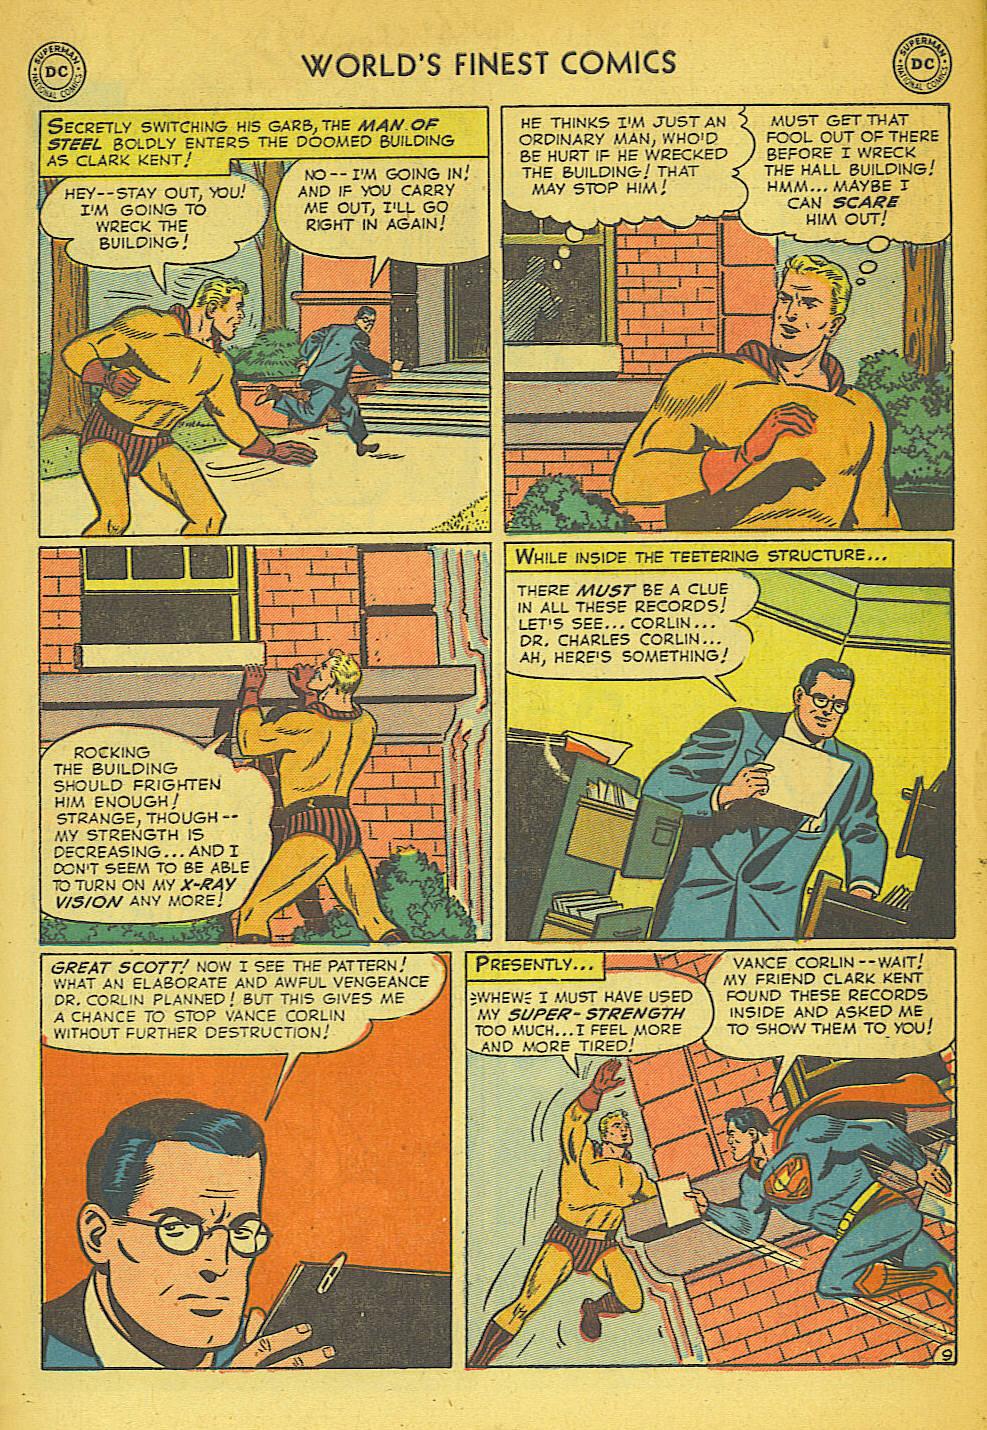 Read online World's Finest Comics comic -  Issue #57 - 11